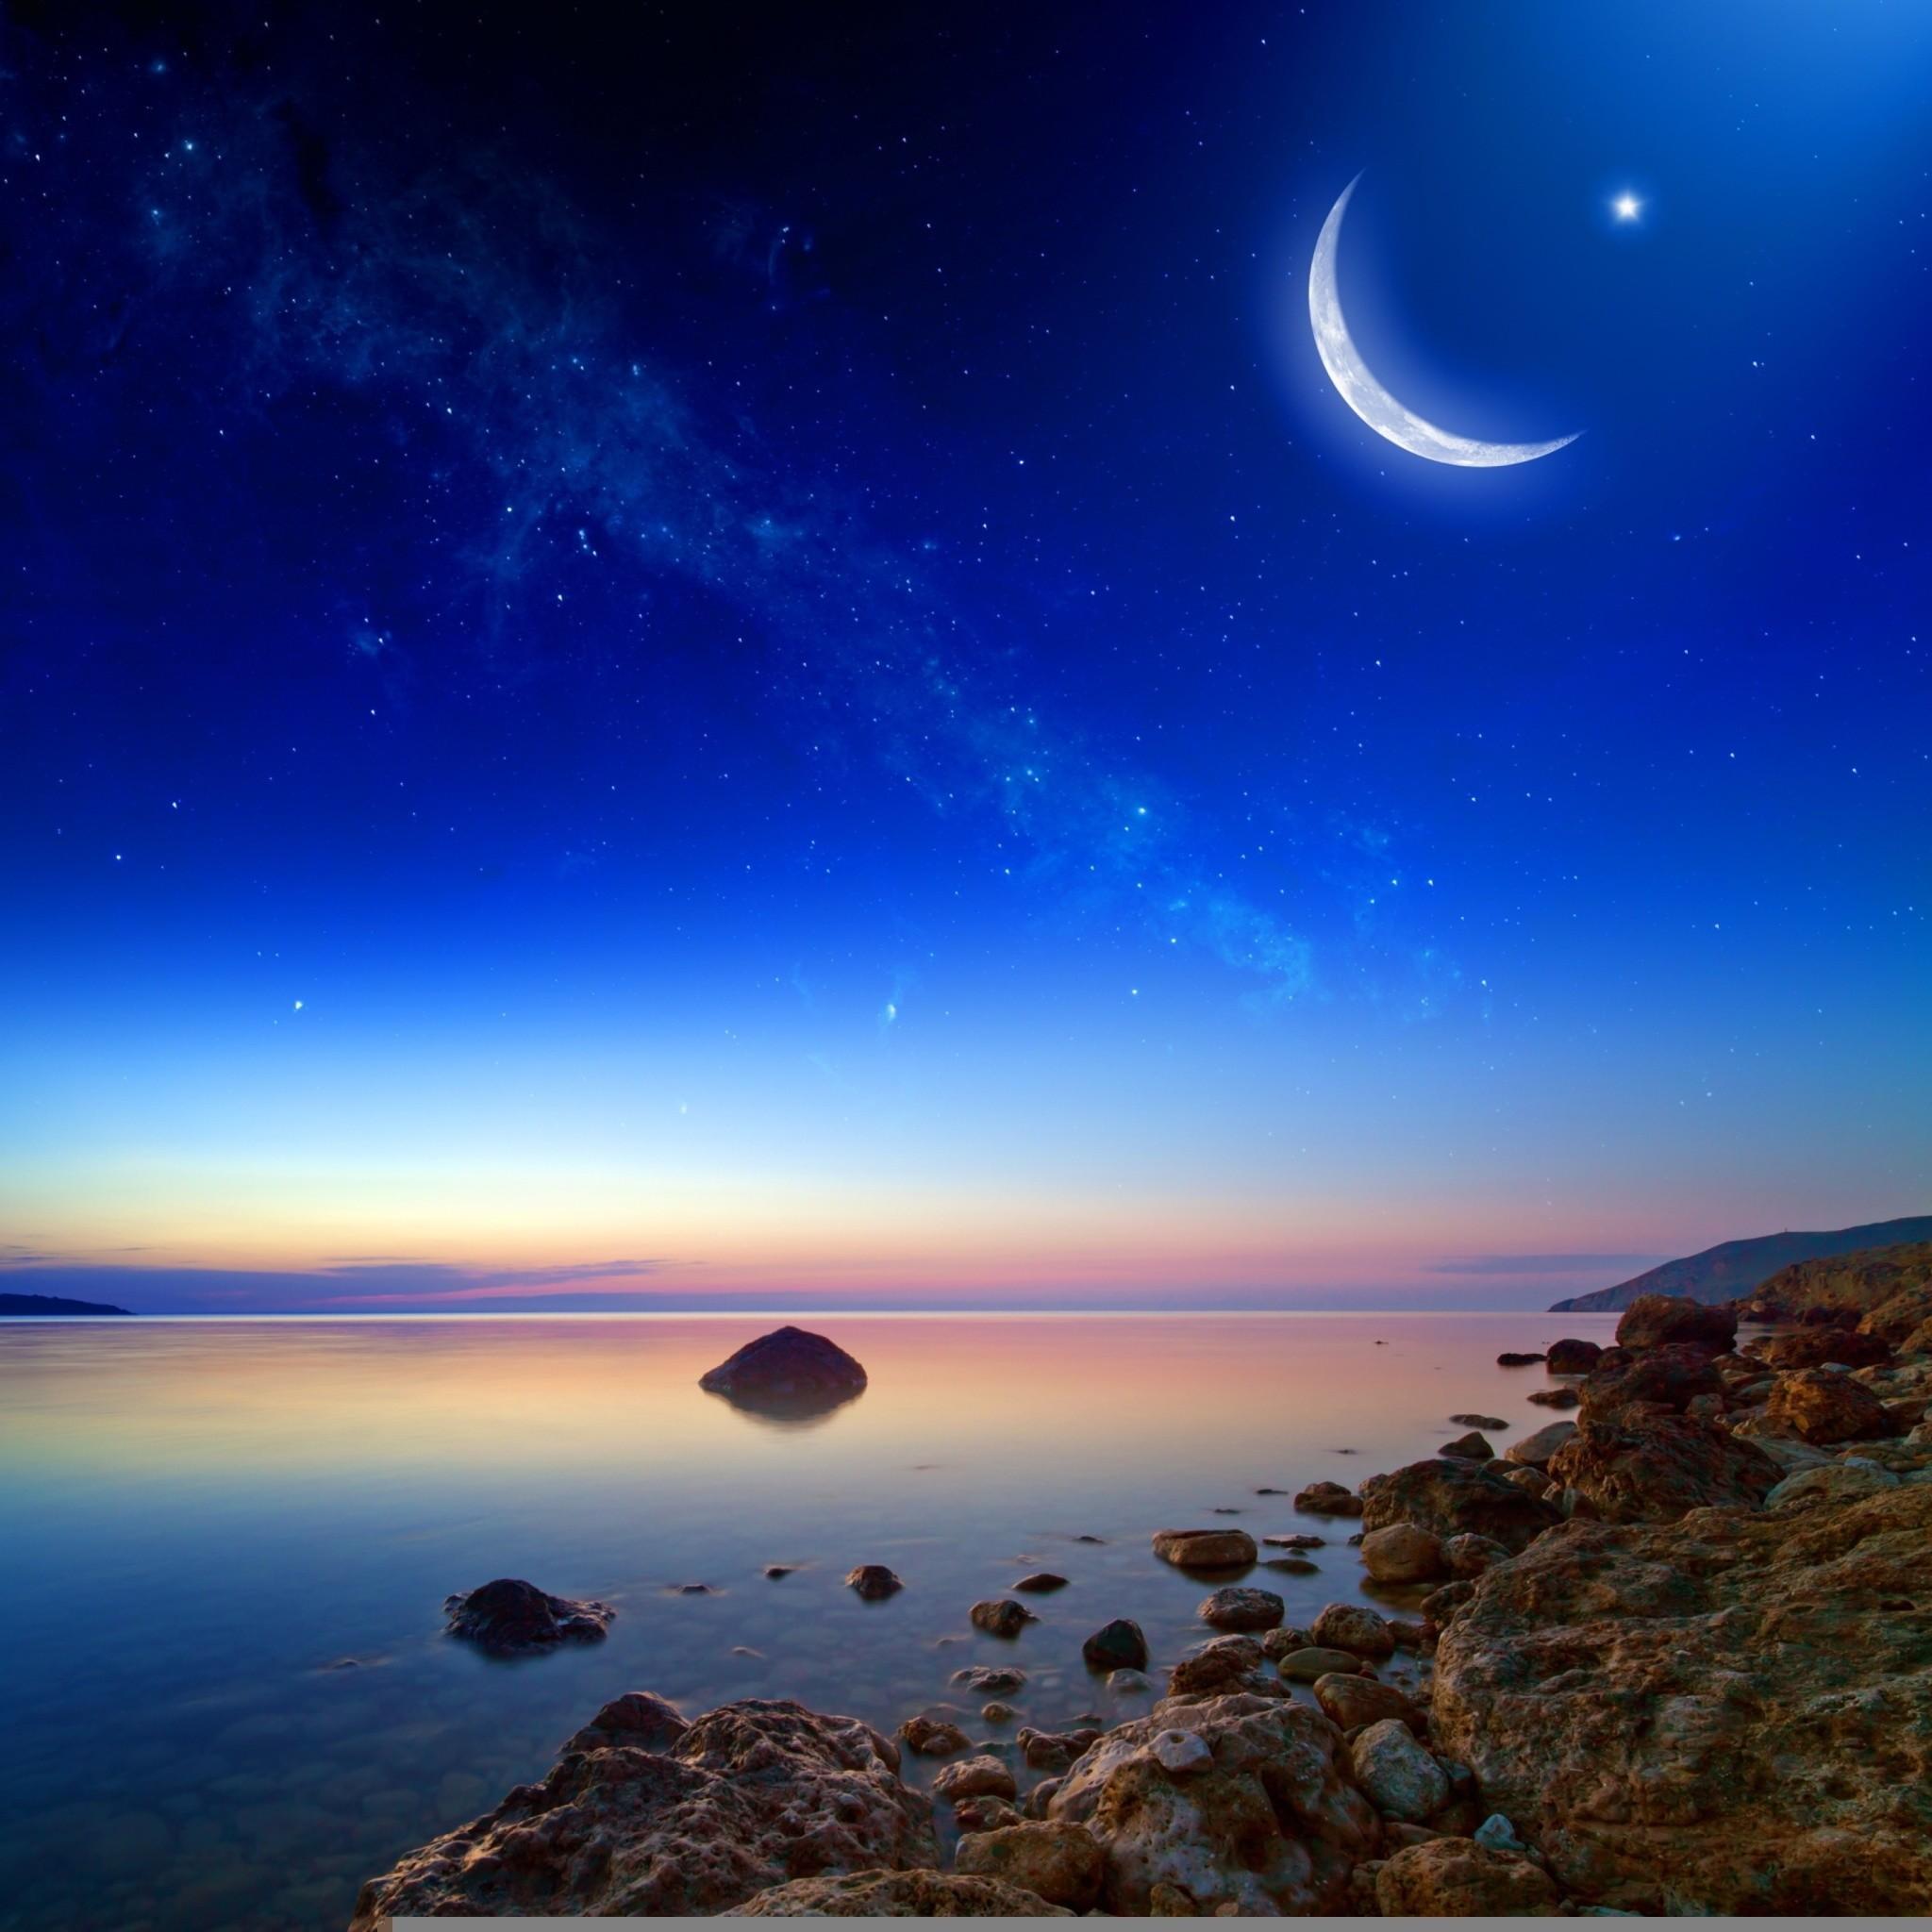 2283 2: Coastal Moonlight Stars iPad wallpaper